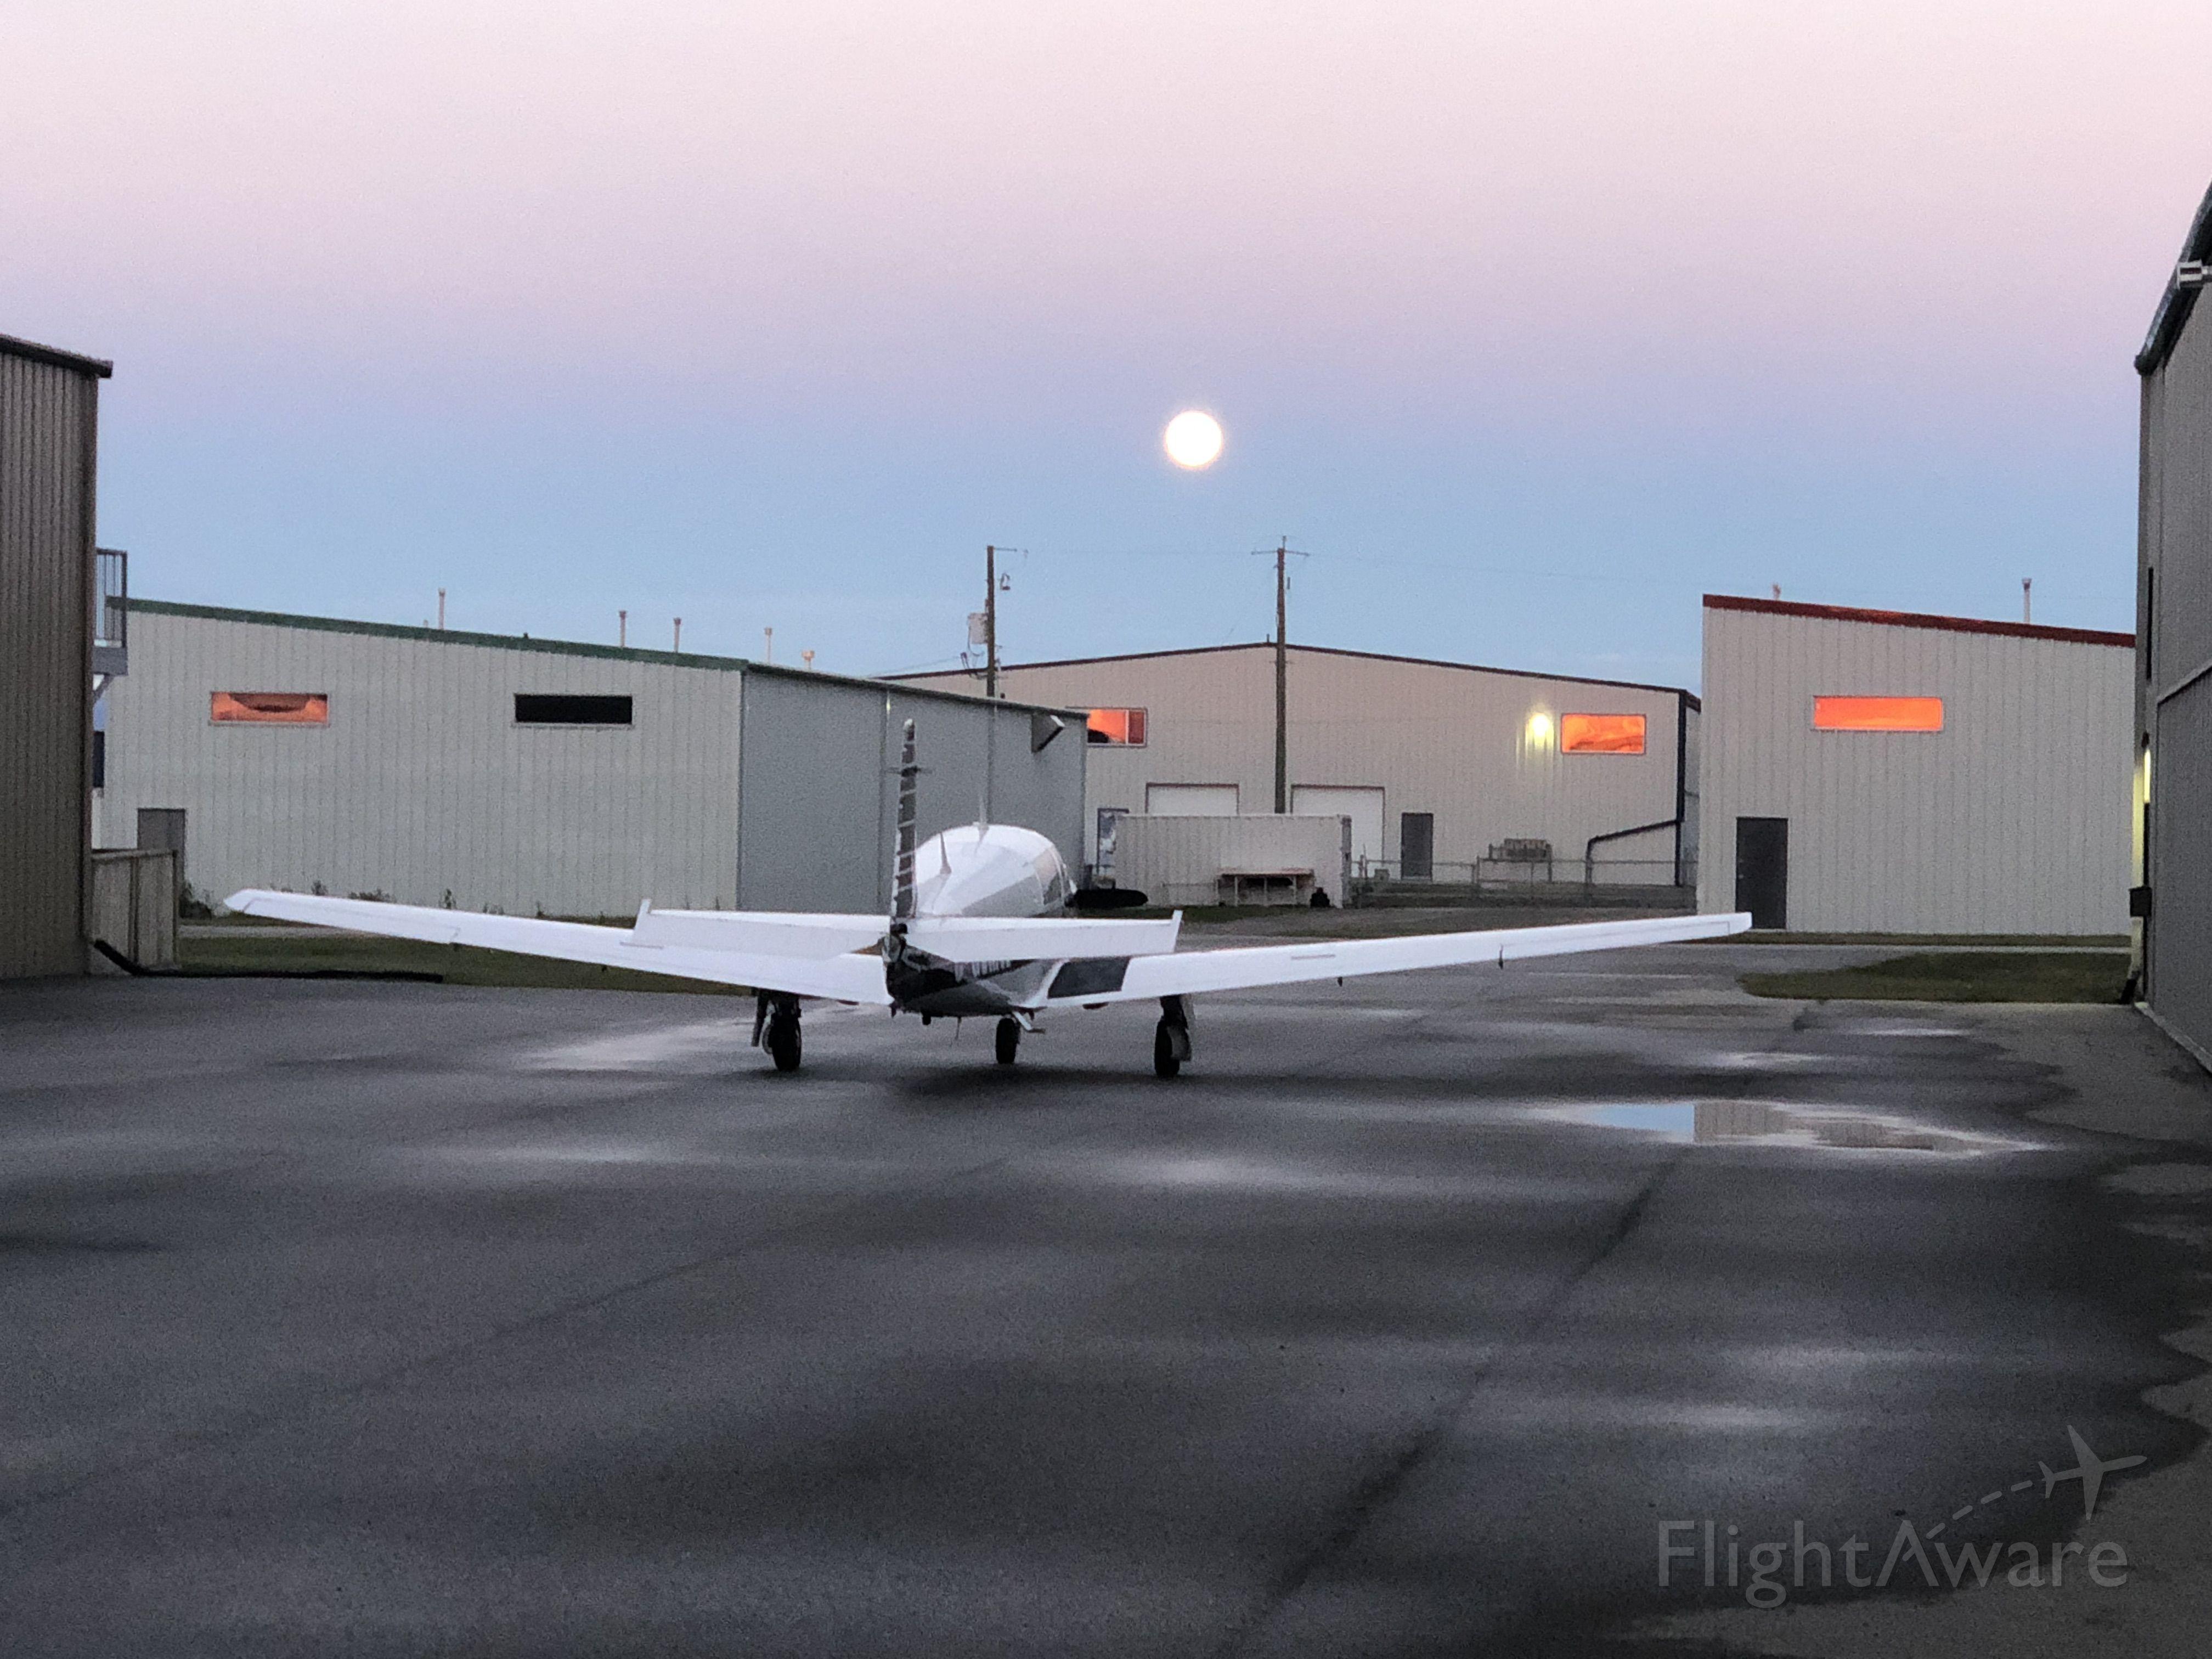 Mooney M-20 Turbo (C-GVMW) - Early morning departure